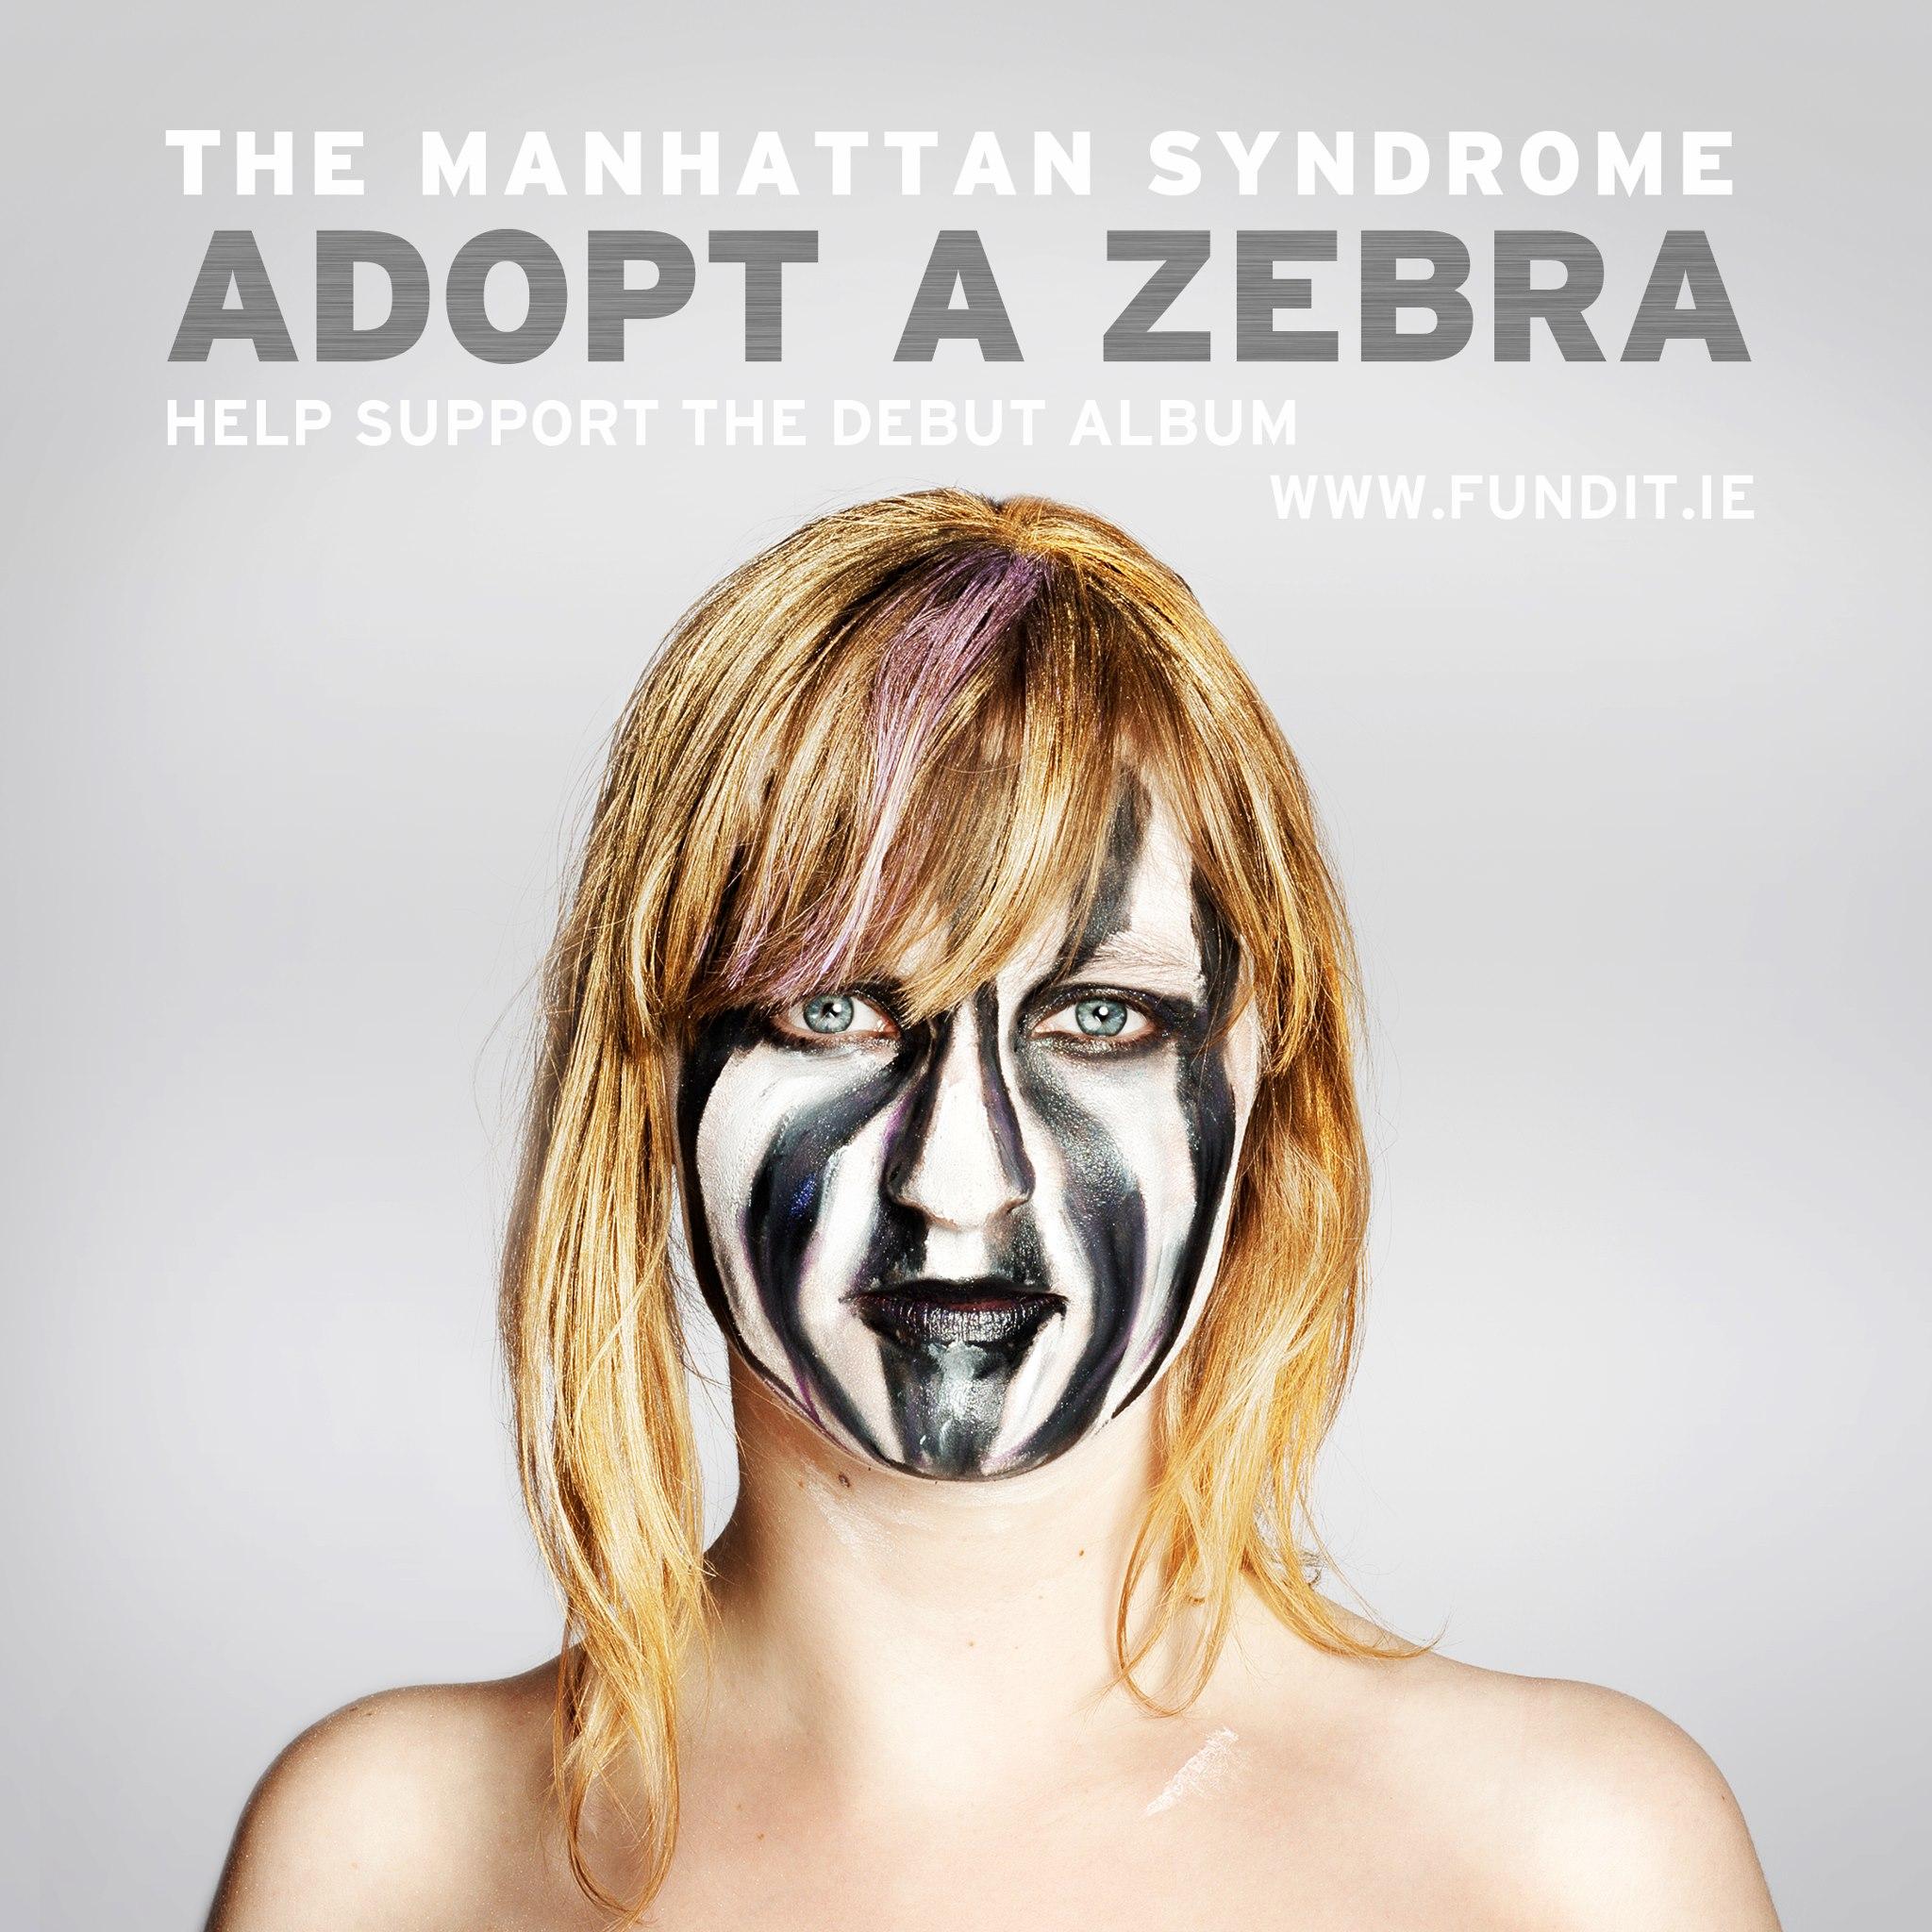 The Manhattan Syndrome